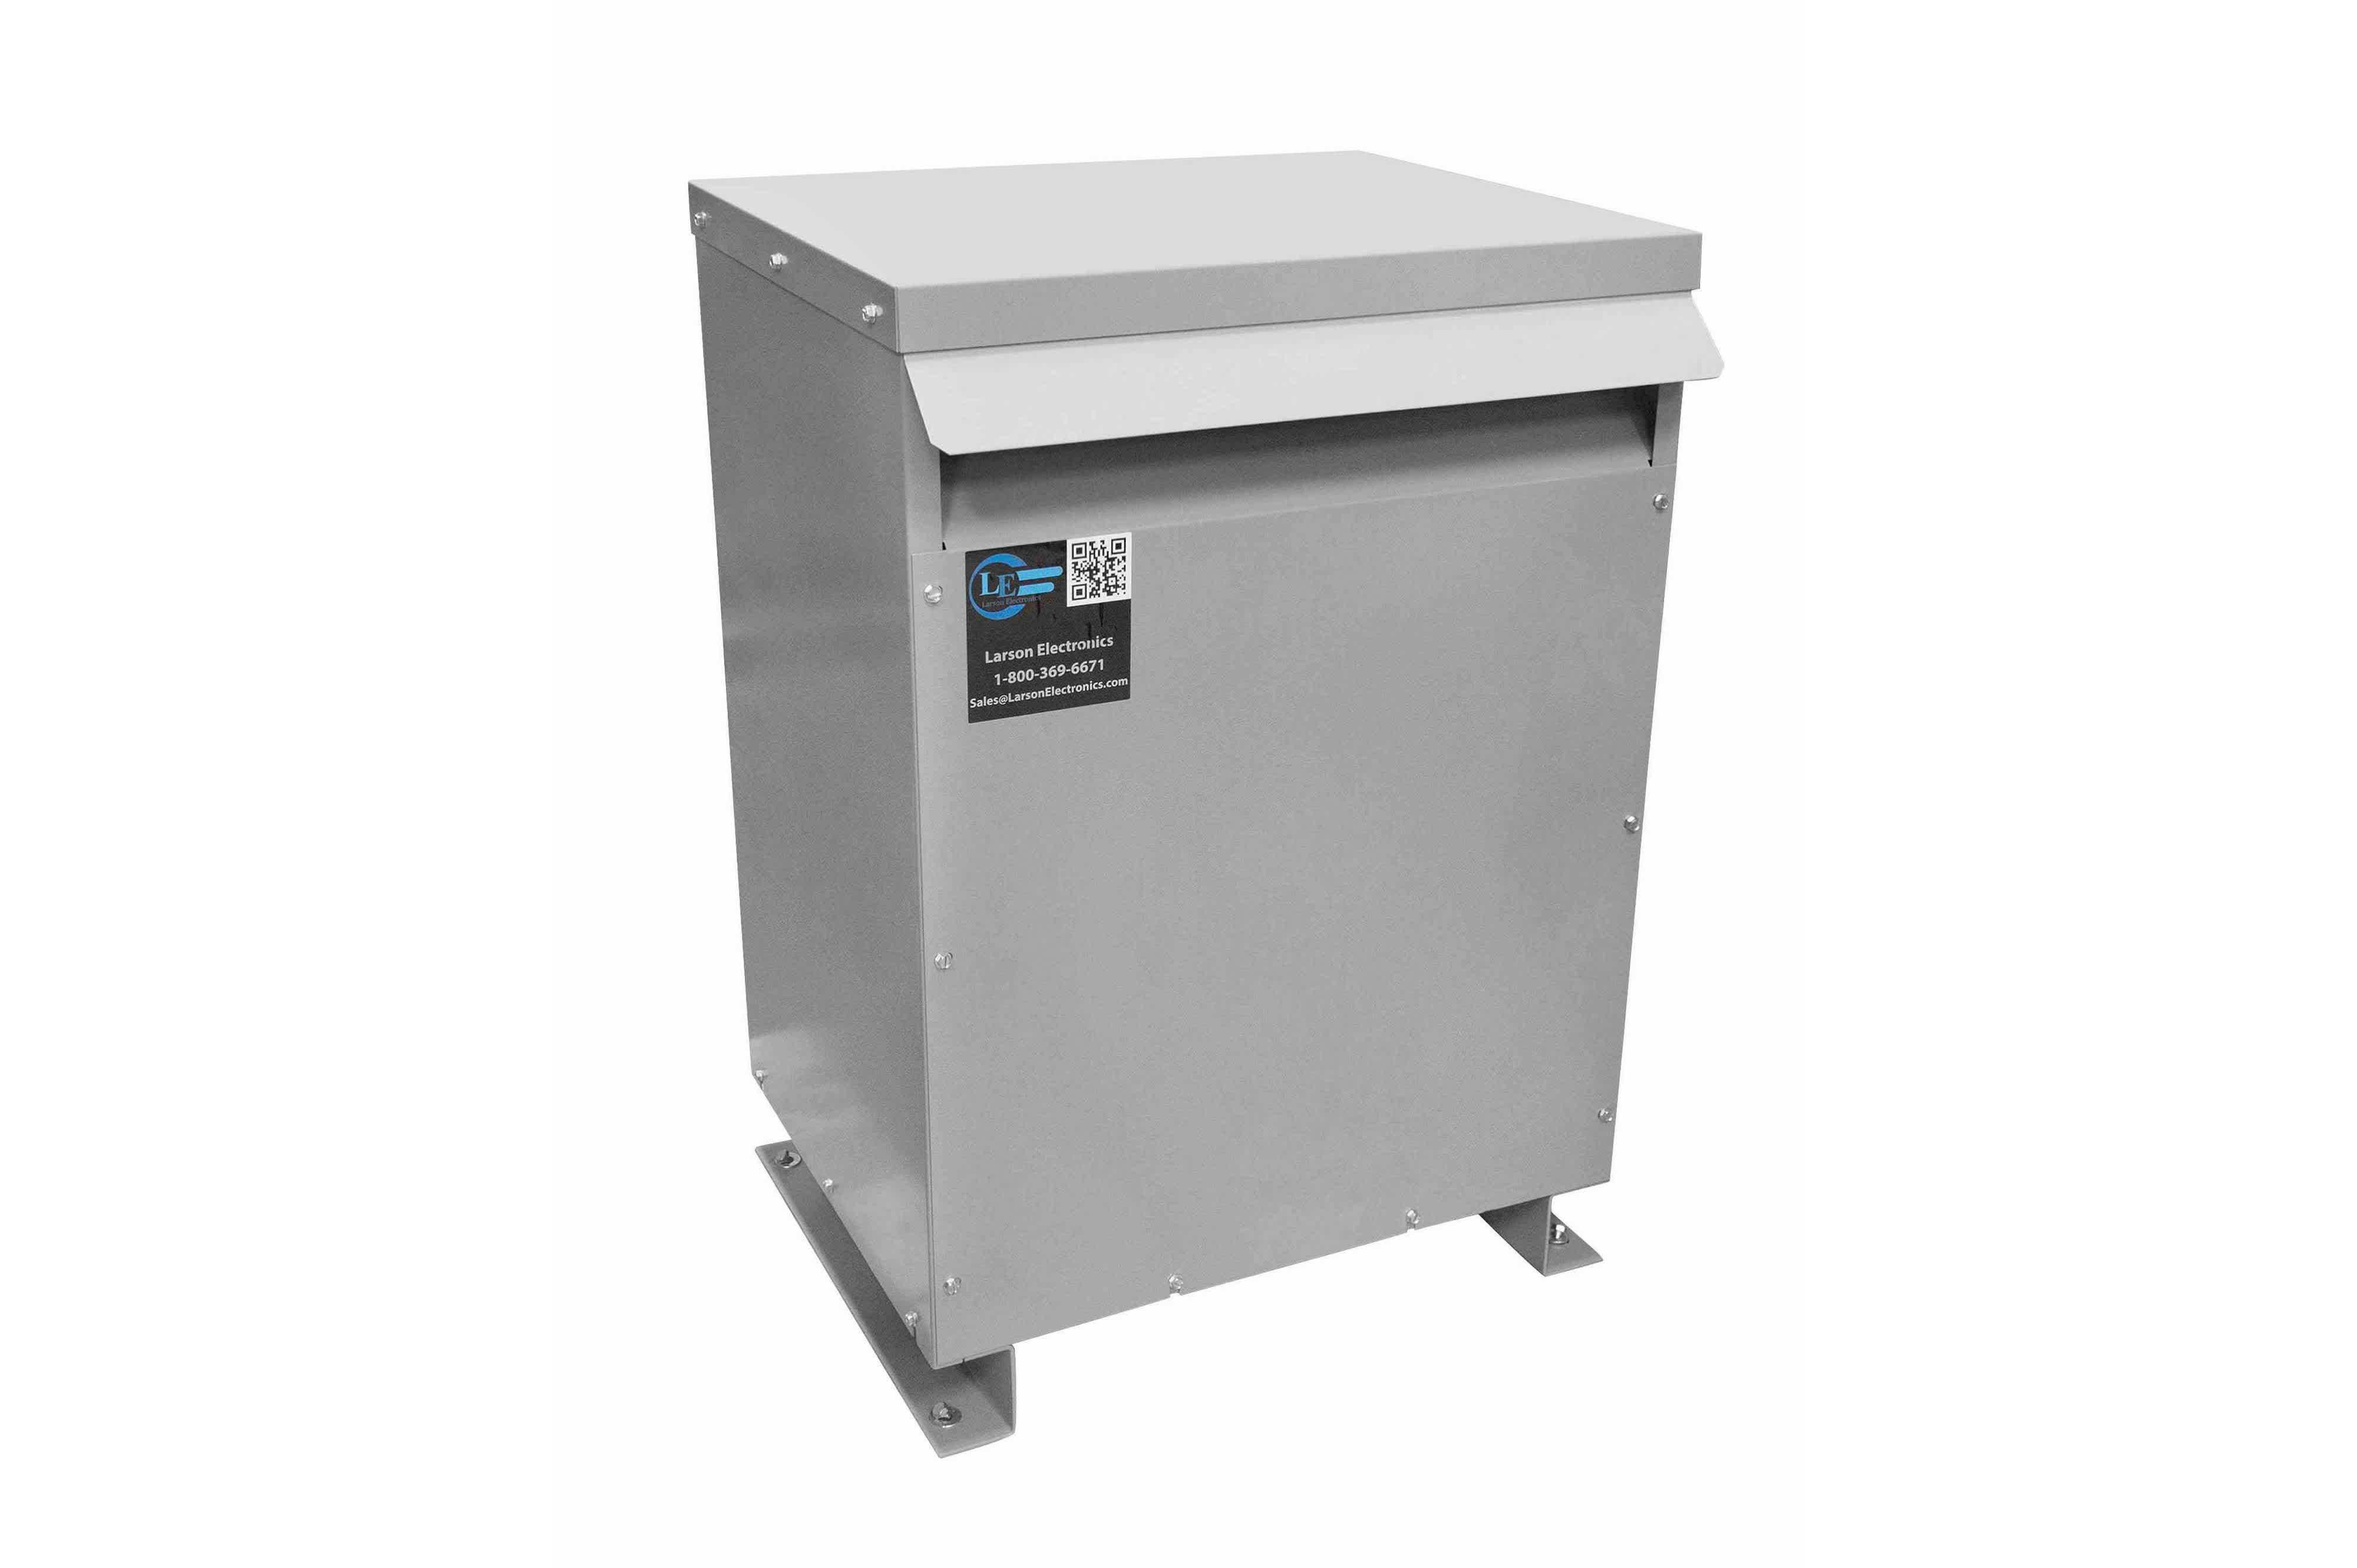 55 kVA 3PH Isolation Transformer, 460V Wye Primary, 400Y/231 Wye-N Secondary, N3R, Ventilated, 60 Hz